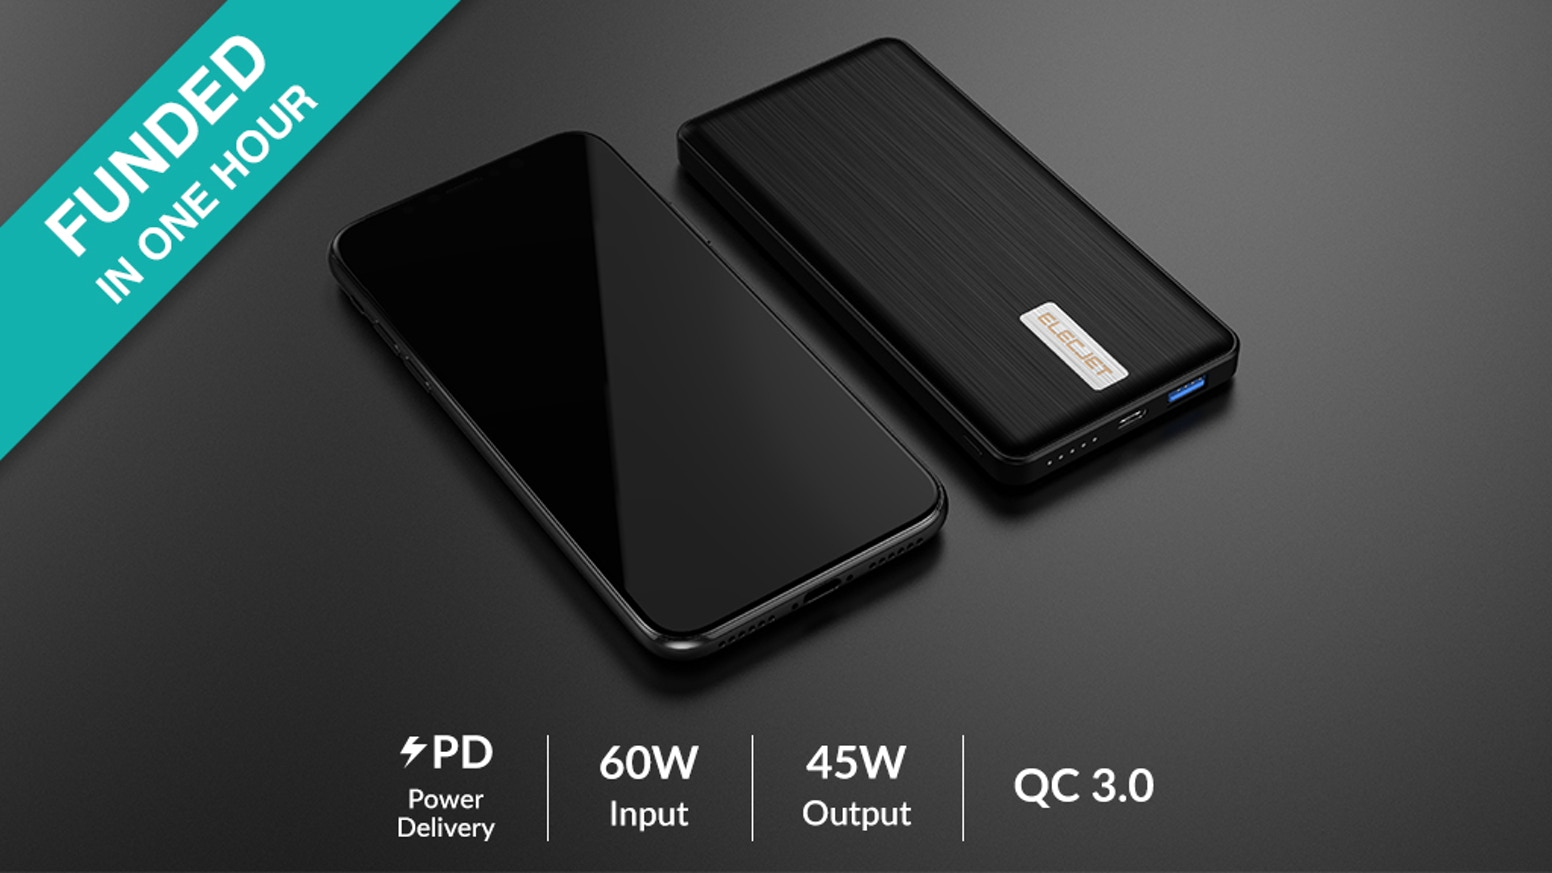 An advanced graphene-enhanced USB-C / A fast charging power bank